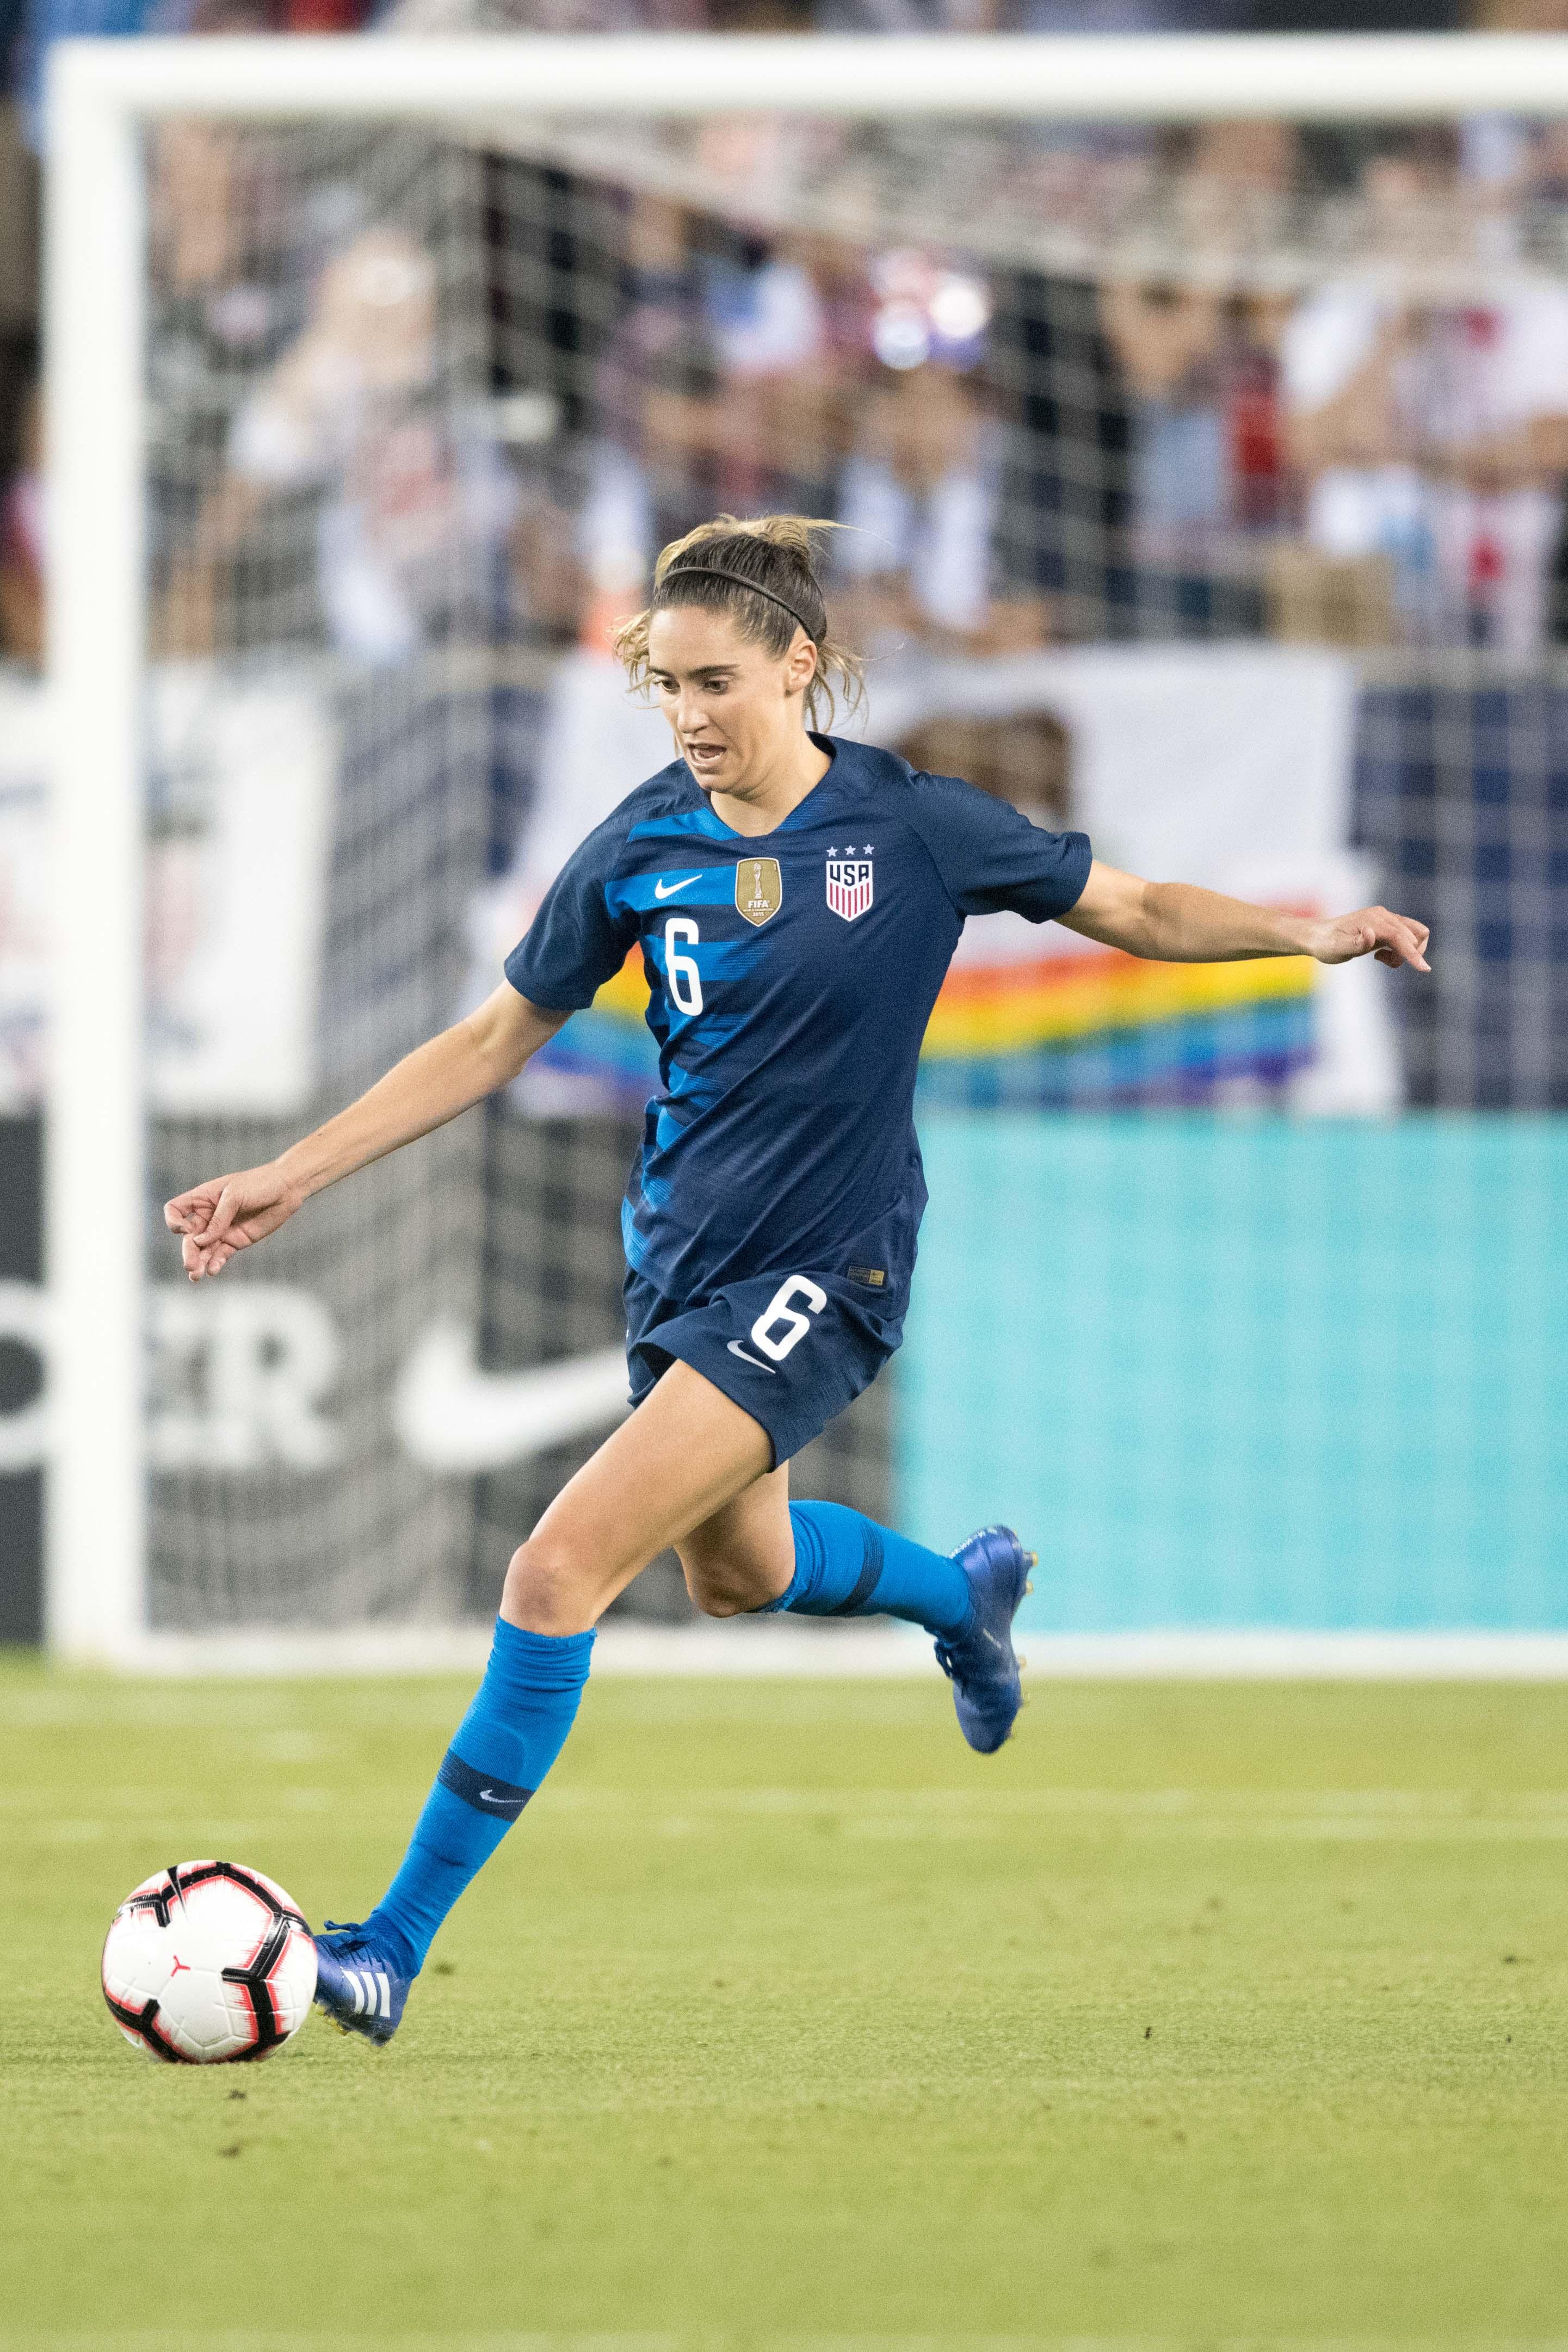 Soccer: International Friendly Women's Soccer-Chile at USA